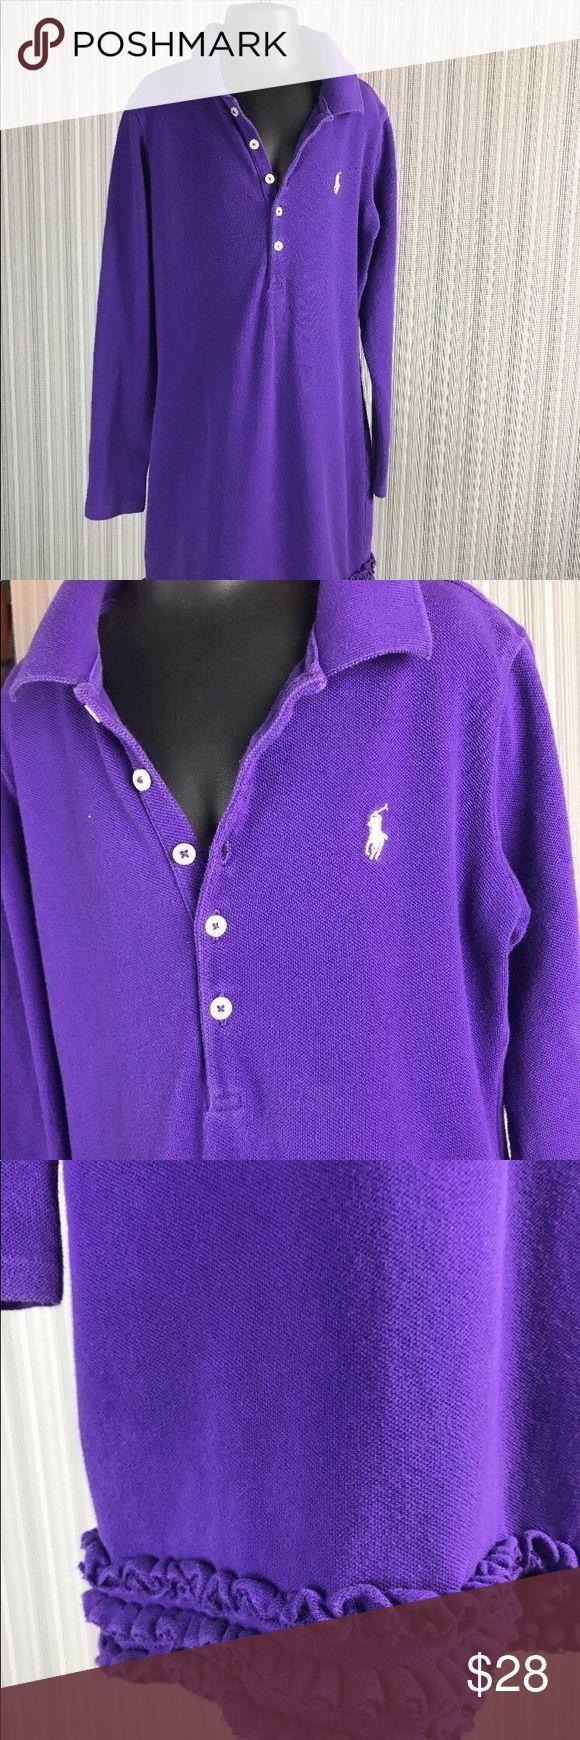 Back To School Girls 8/10 Ralph Lauren Purple Back To School Girls 8/10 Ralph Lauren Purple Long Sl Knit Ruffle Hem Polo Dress Ralph Lauren Dresses Casual